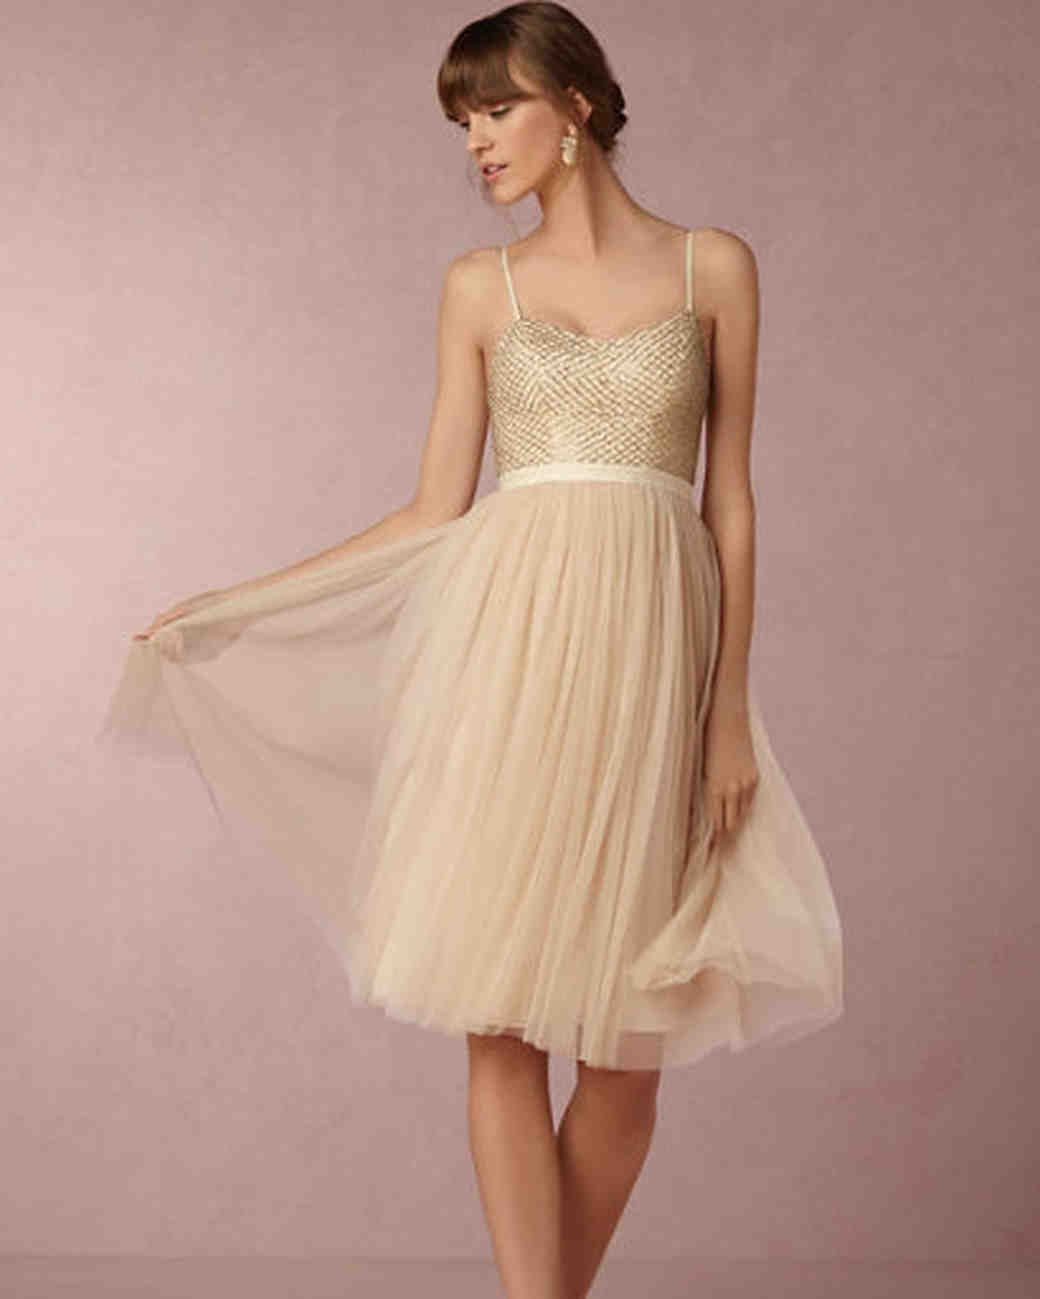 Short Gold Bridesmaid Dresses